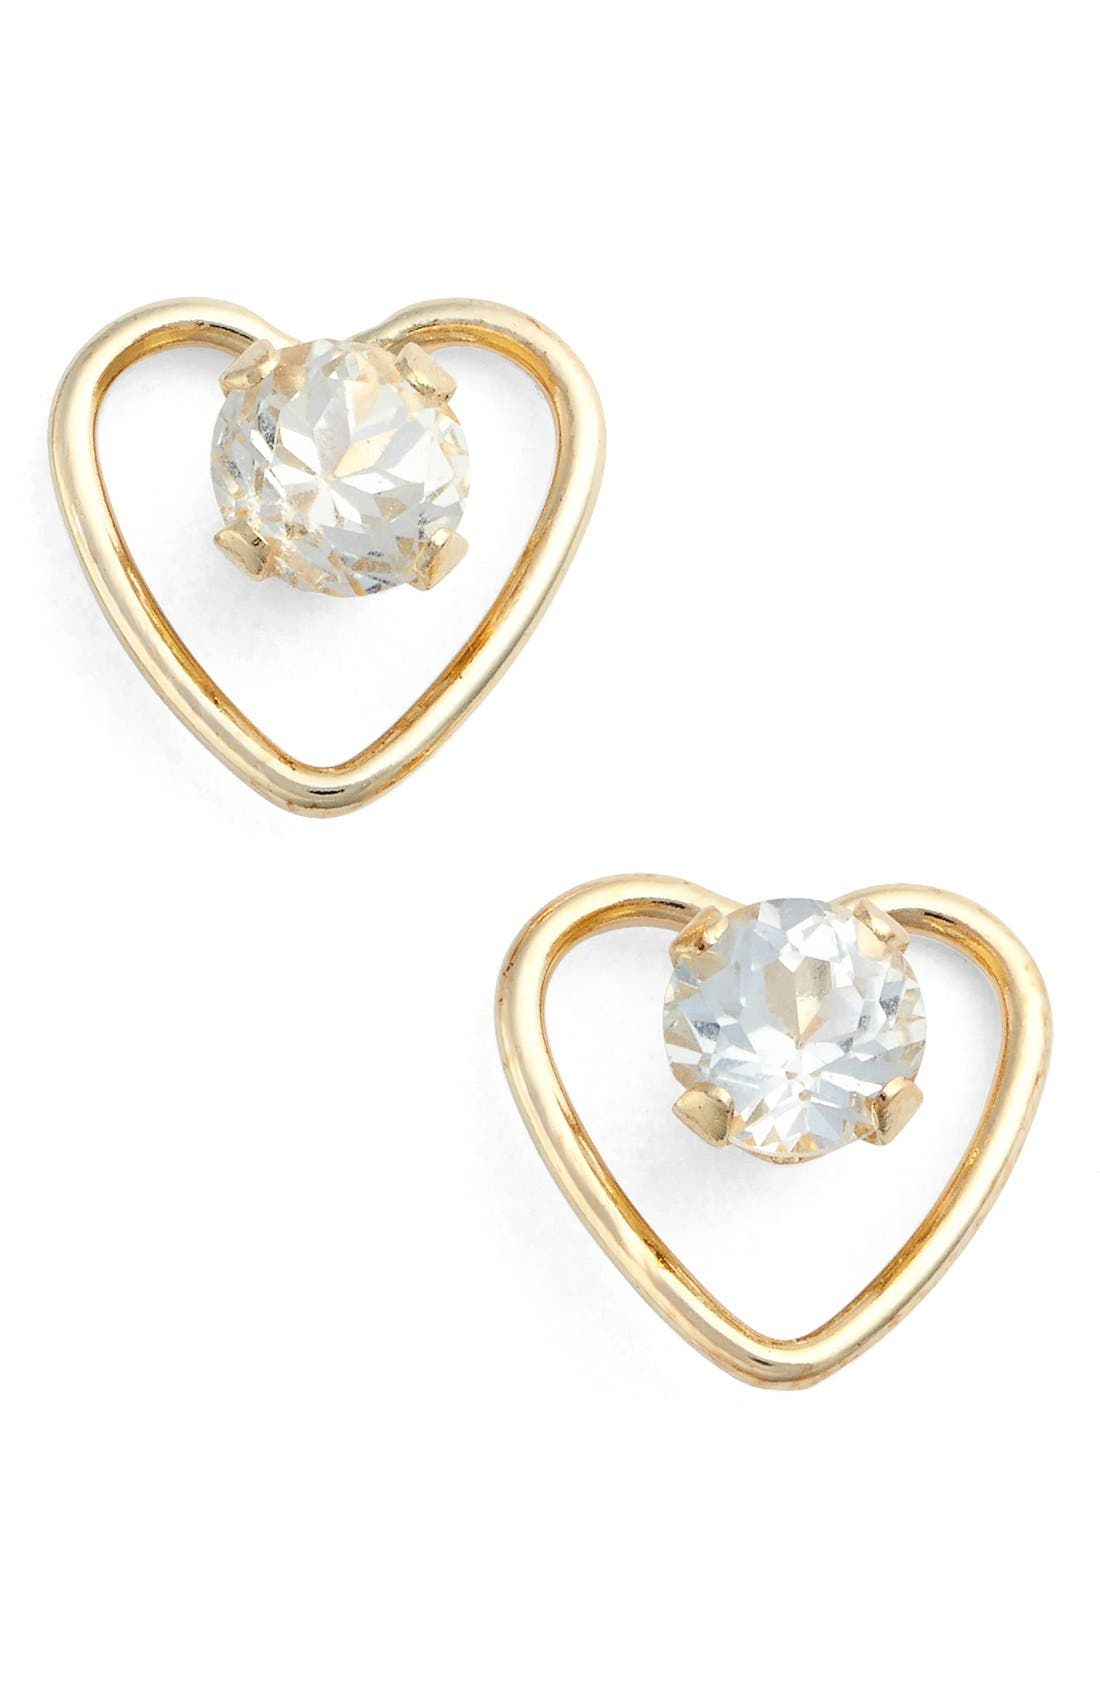 Alternate Image 1 Selected - Kardee Jewelry Cubic Zirconia Heart Earrings (Big Girls)